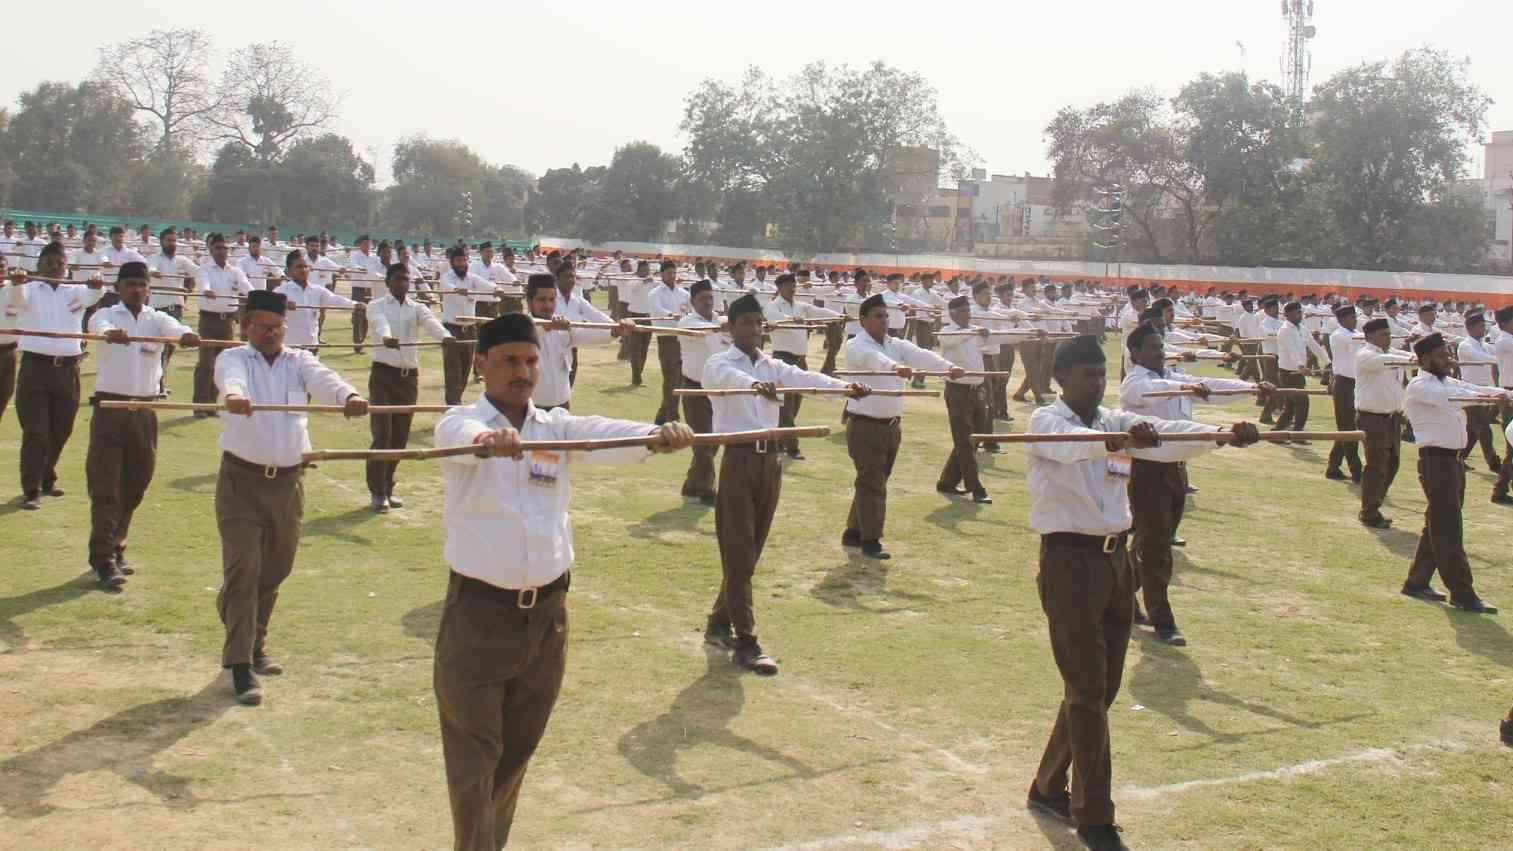 Why RSS is so eager on Ram Mandir : Mohan Bhagwat speech on Vijaydashmi - Satya Hindi